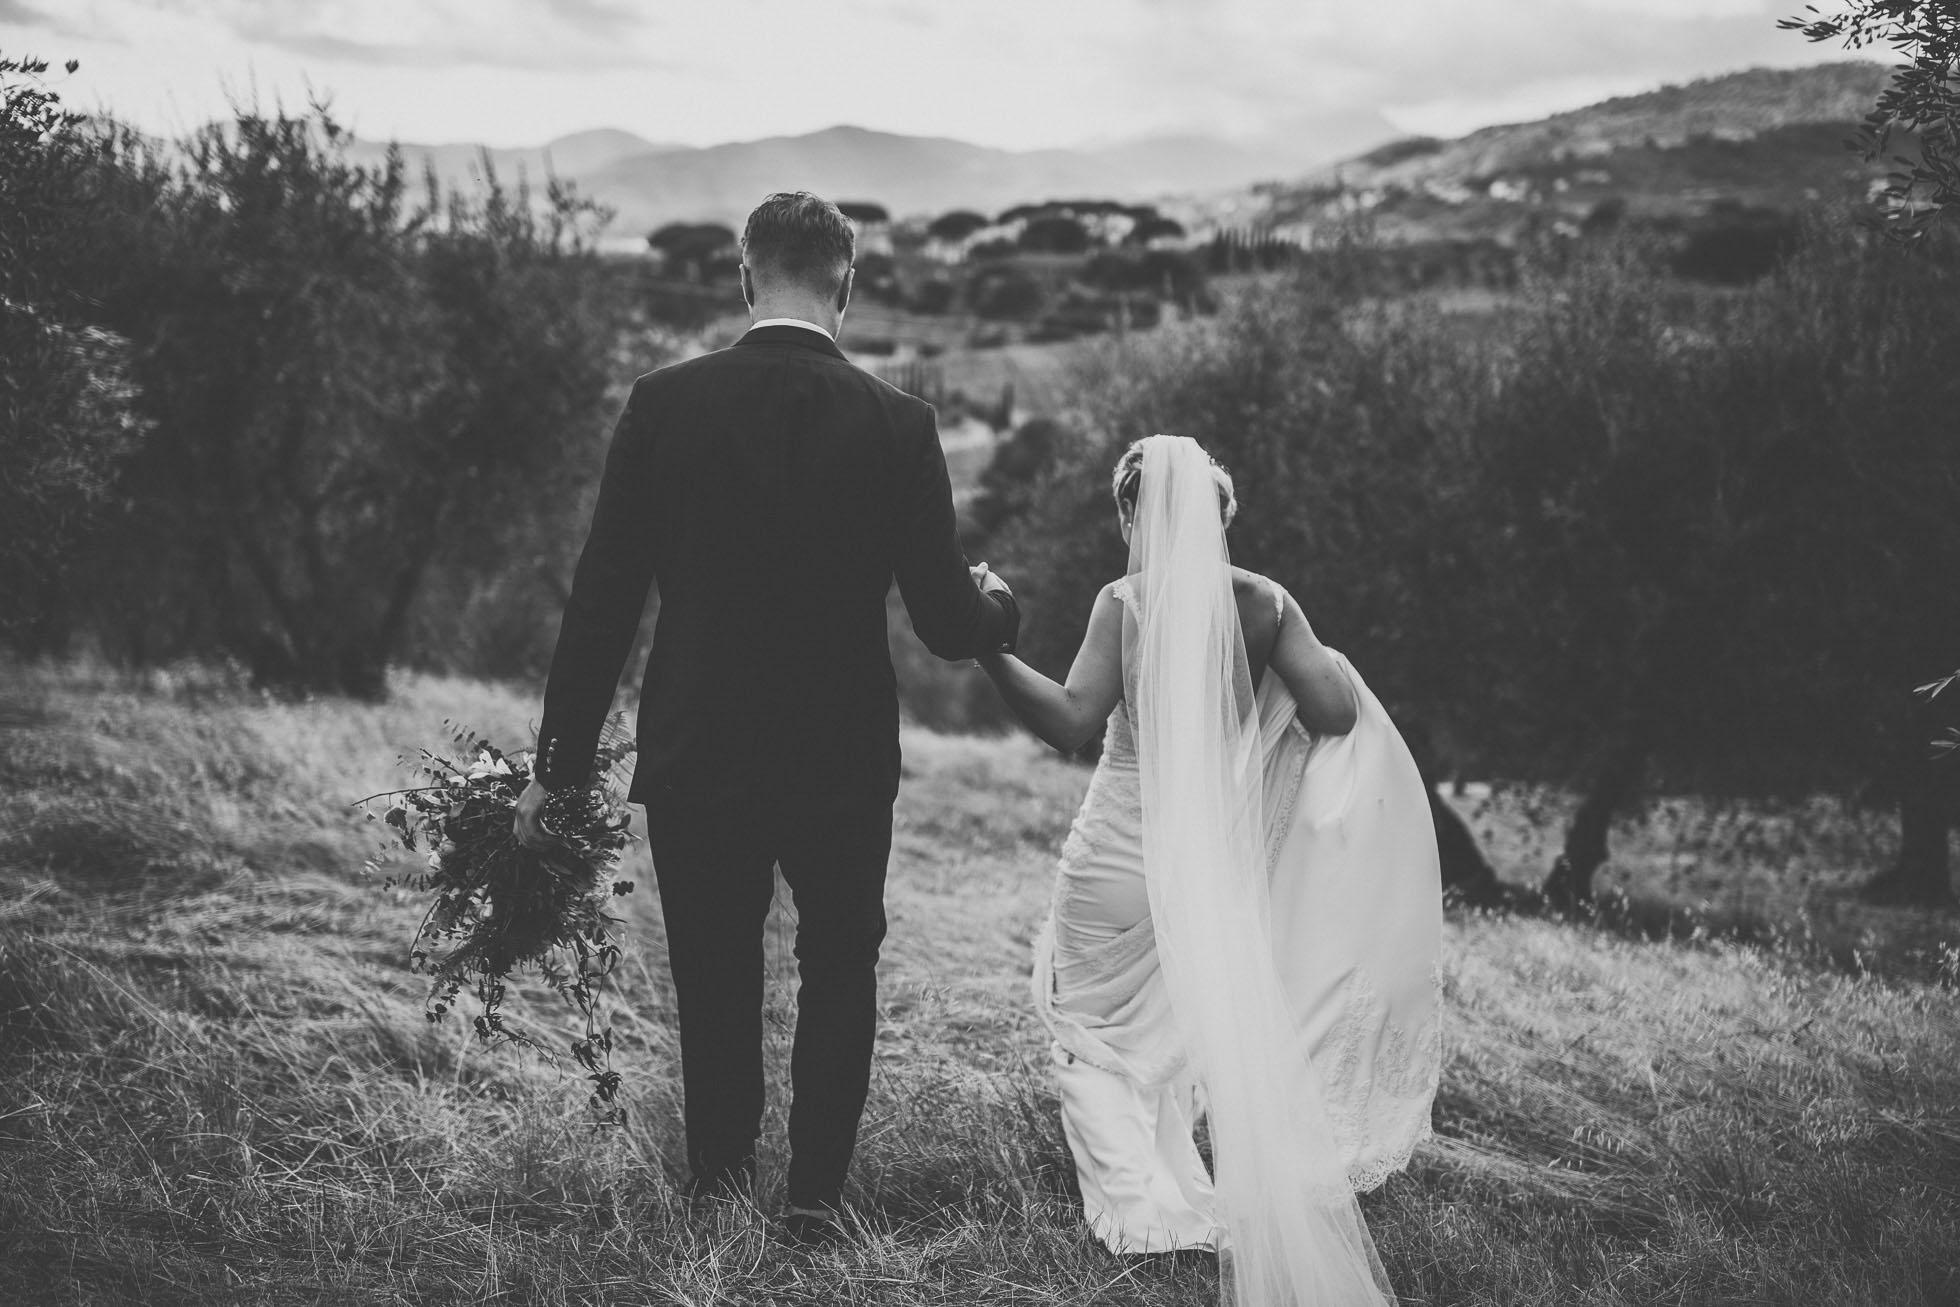 tenuta_san_pietro_wedding_photographer-49.jpg